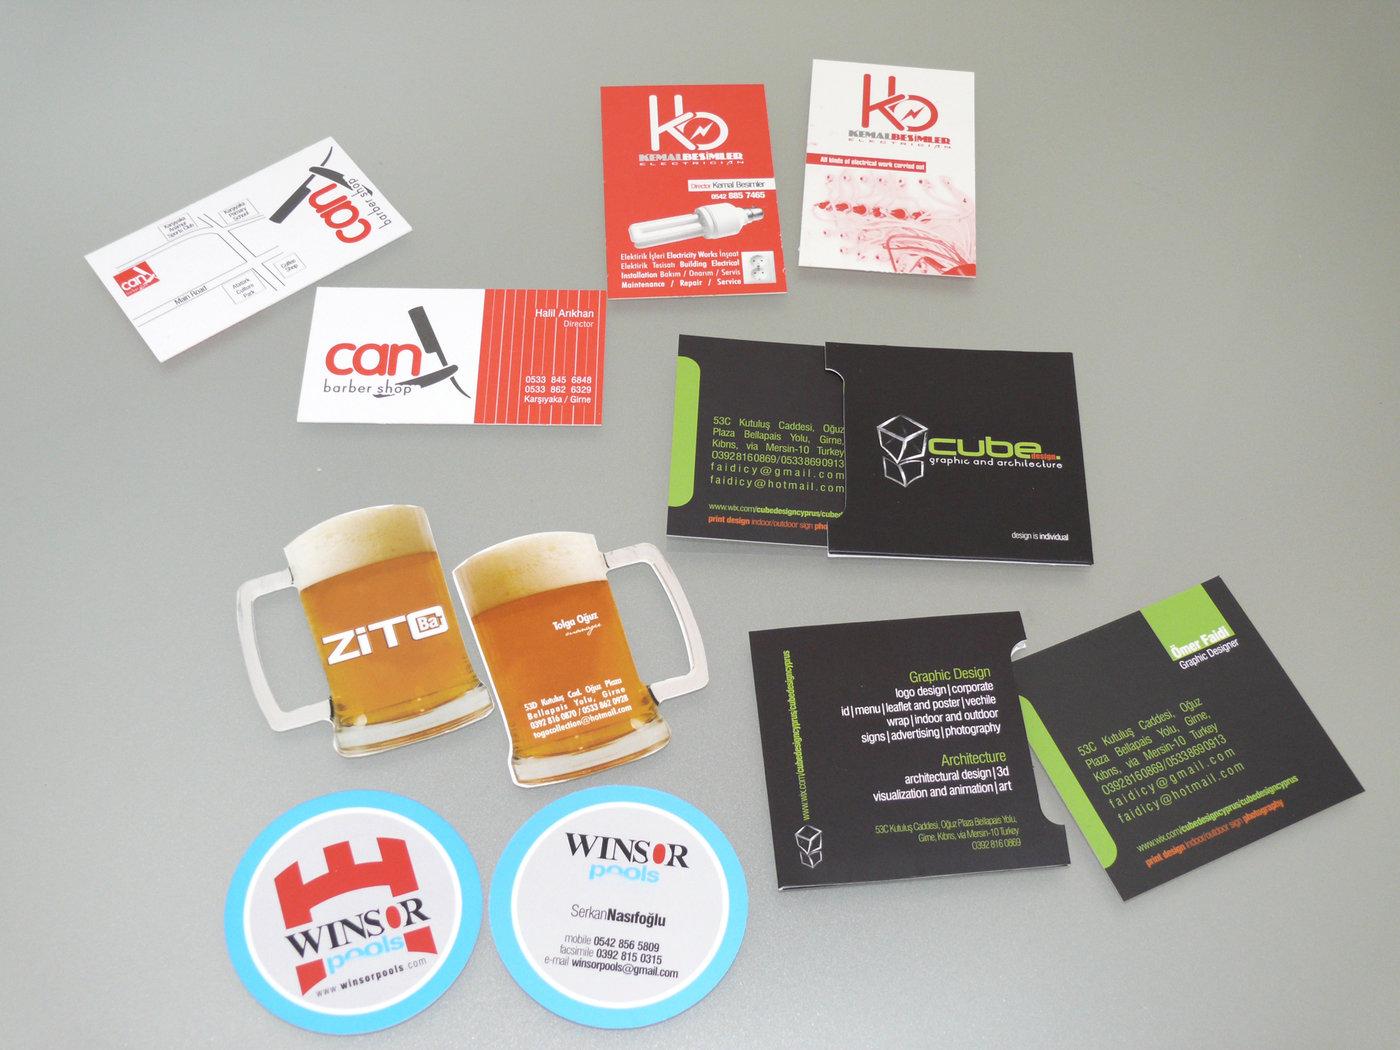 Business card by mer faidi at coroflot the magic touch kyrenia emine seyitolu business card cube design cyprus the best of business card design magicingreecefo Choice Image